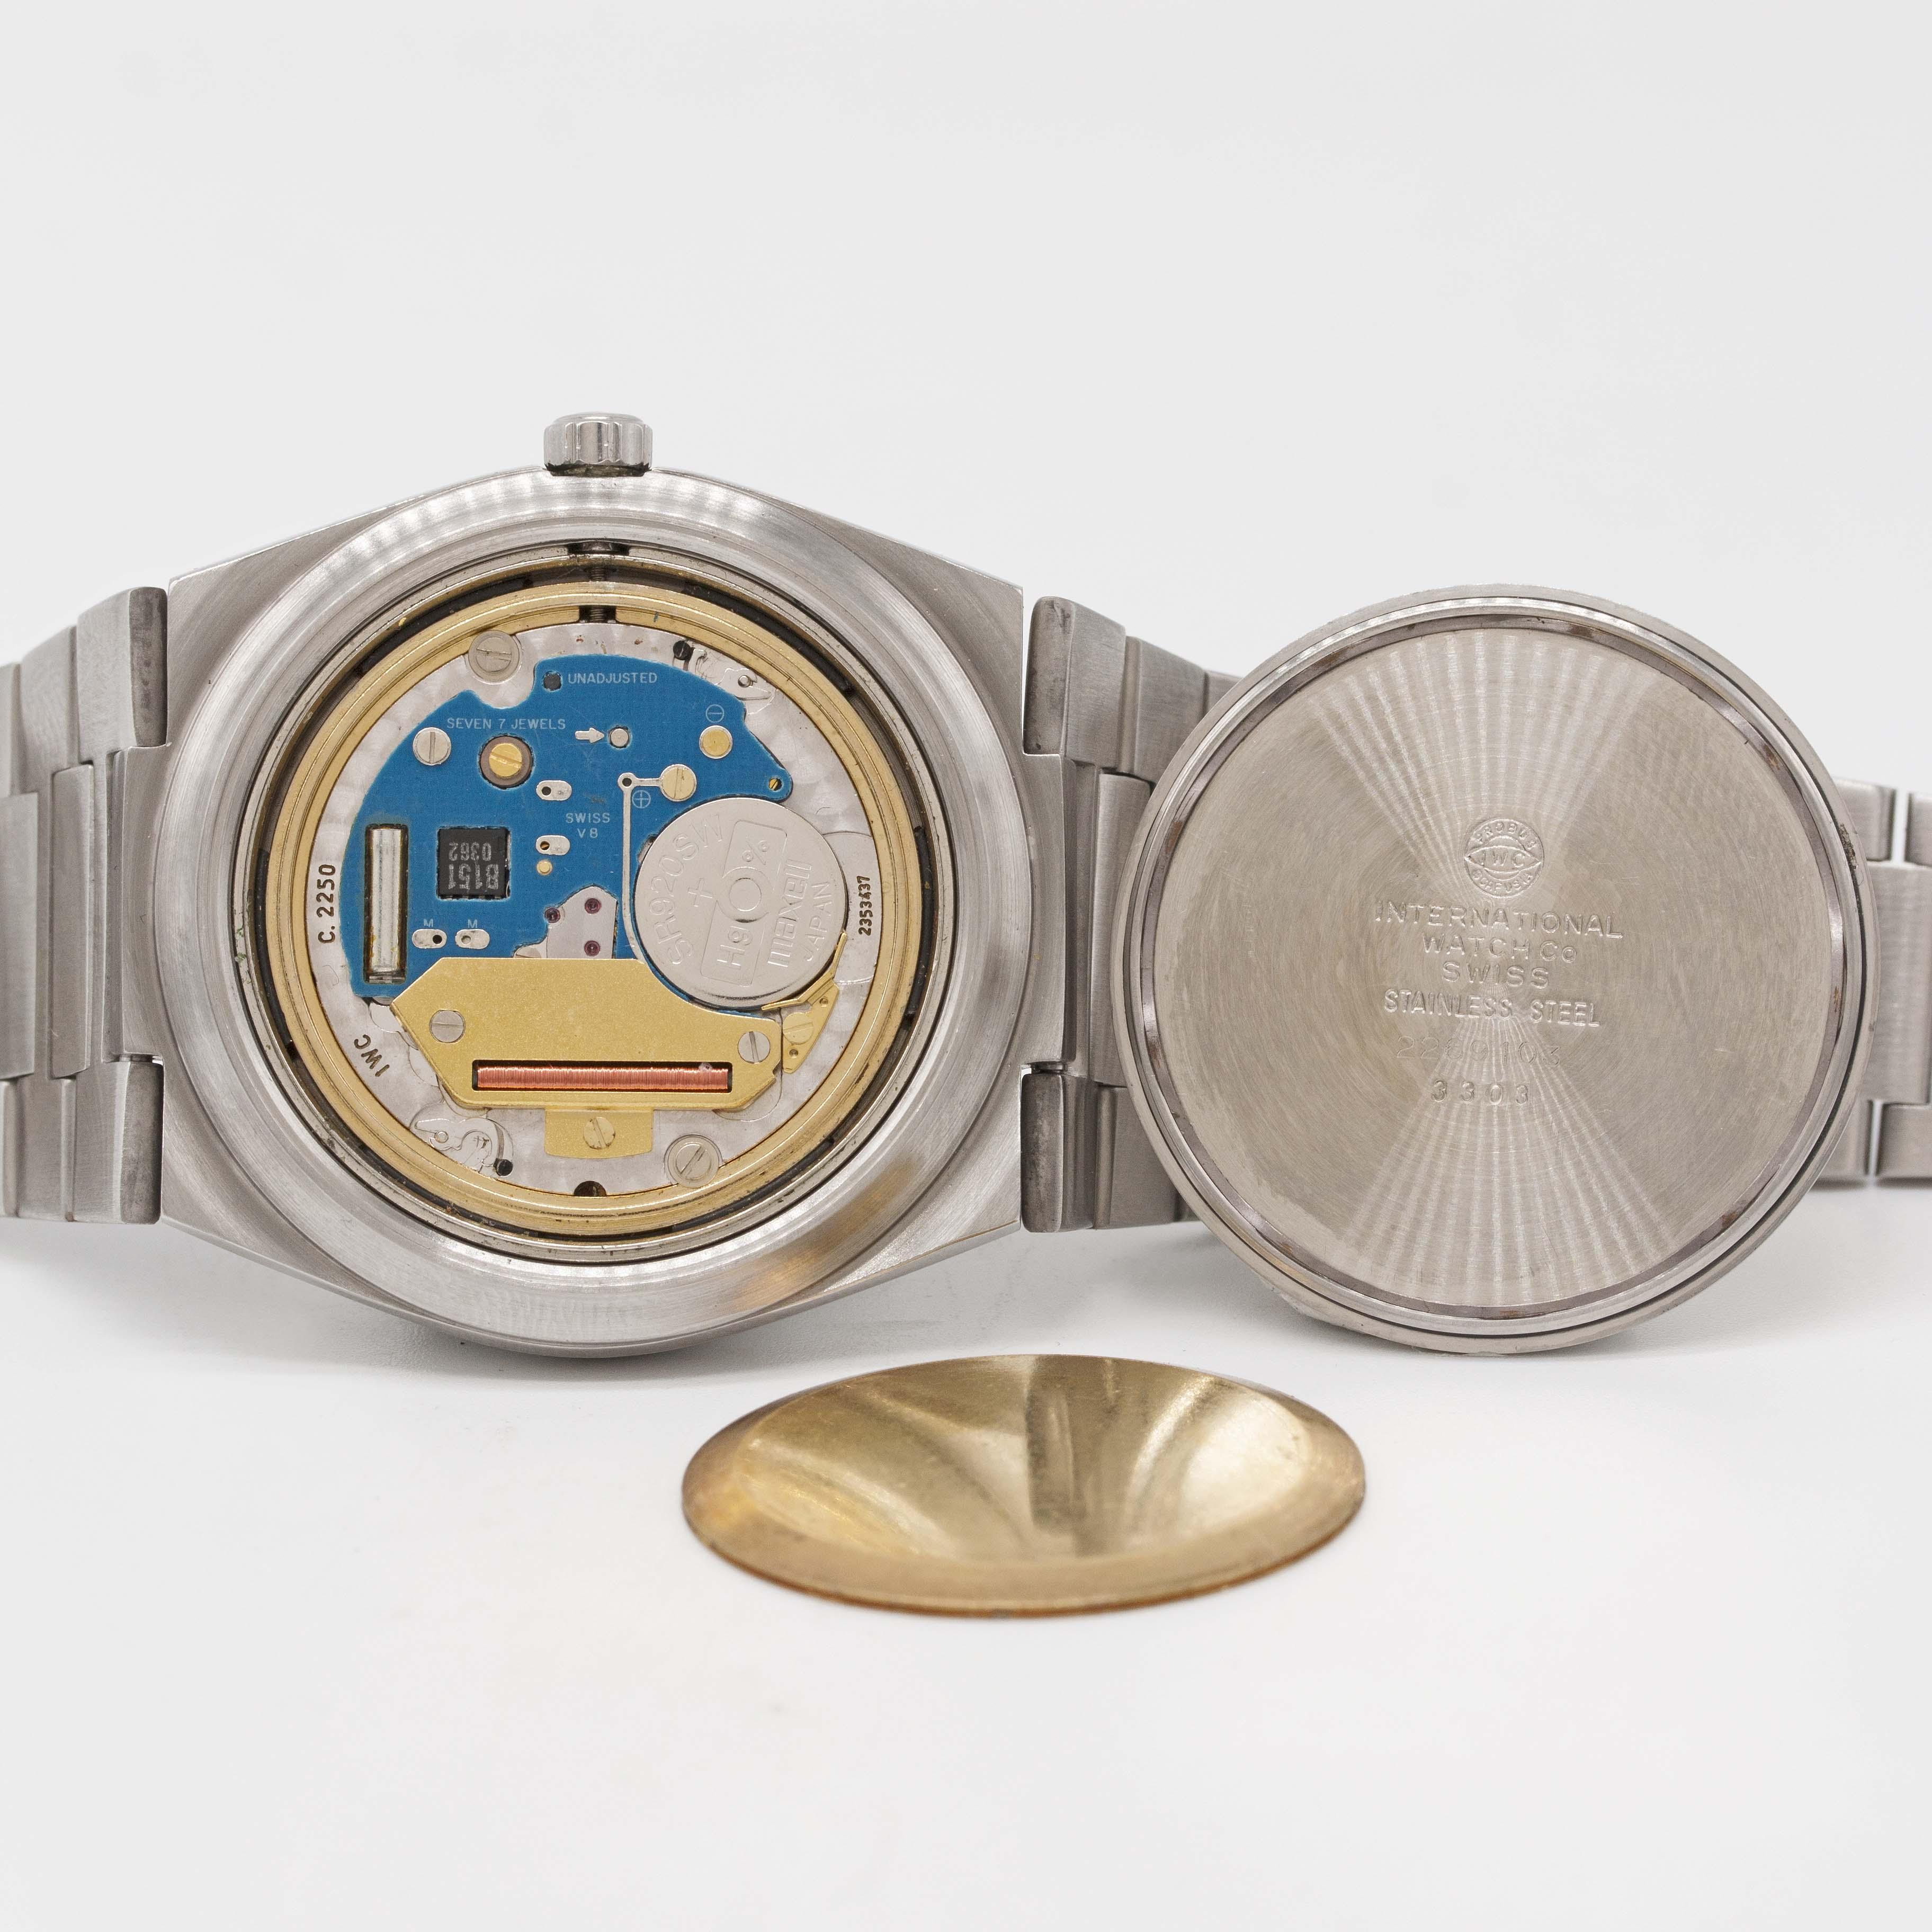 "Lot 56 - A GENTLEMAN'S STAINLESS STEEL IWC INGENIEUR SL ""JUMBO"" QUARTZ BRACELET WATCH CIRCA 1980, REF. 3303"